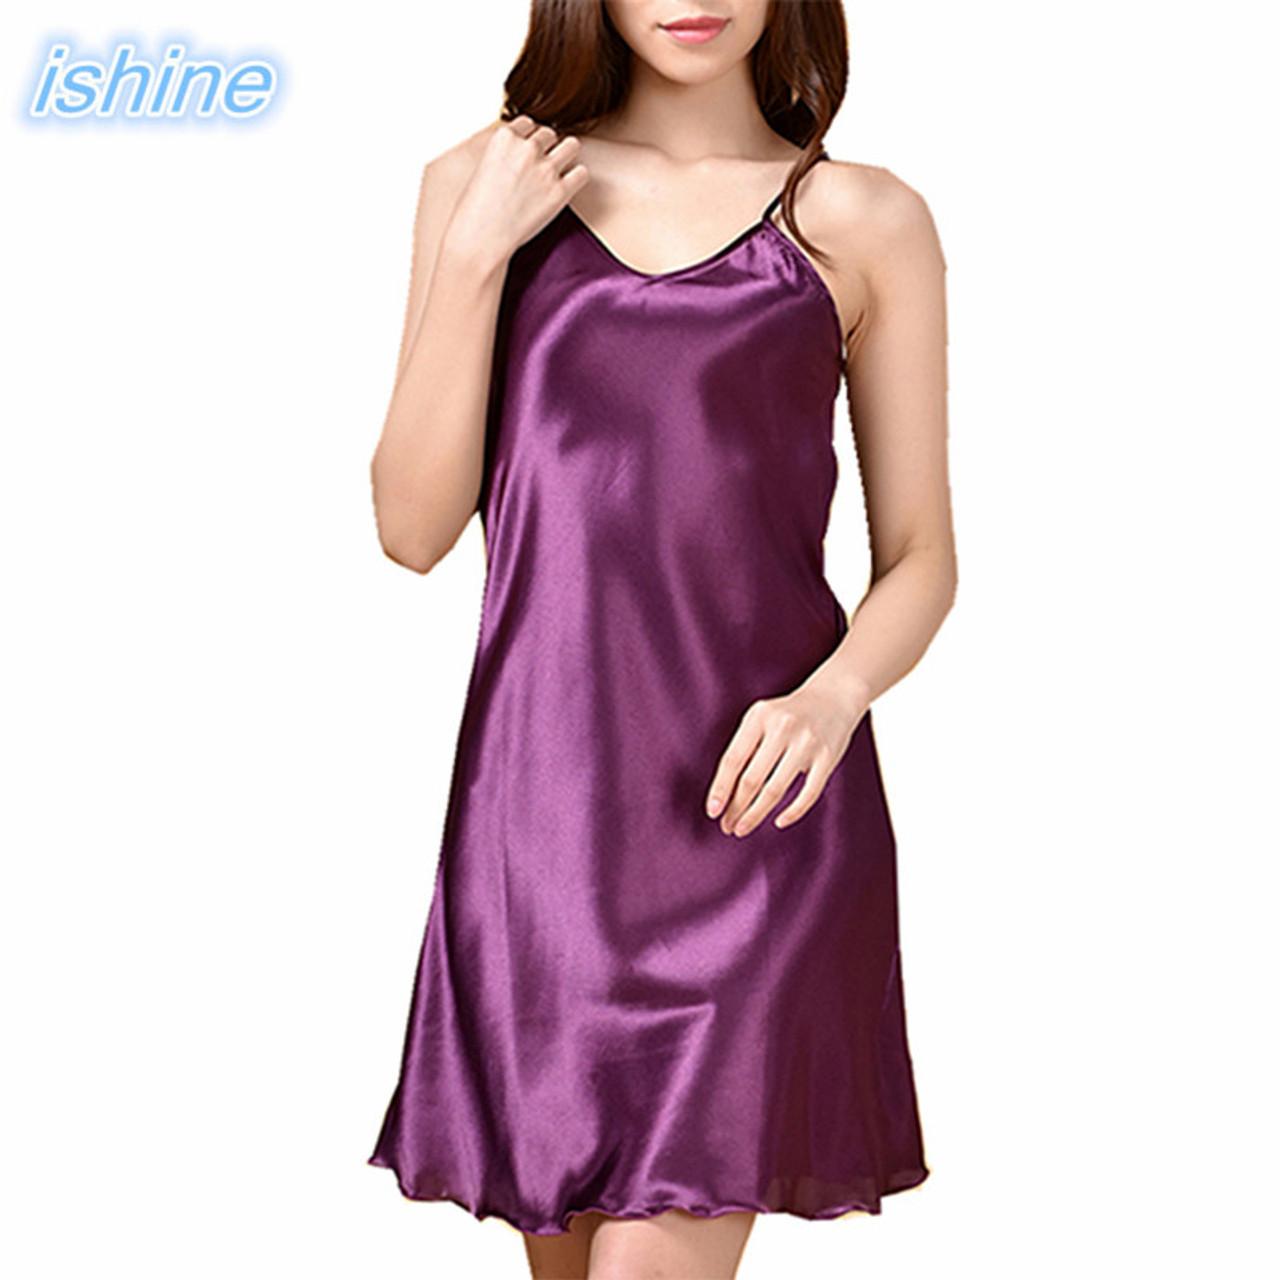 27a4fc4c4f97 ... Satin Silk Nightwear Women Nightgowns Sexy V-neck Sleepwear Sleeping  Dress Red Nightdress 2018 Summer ...